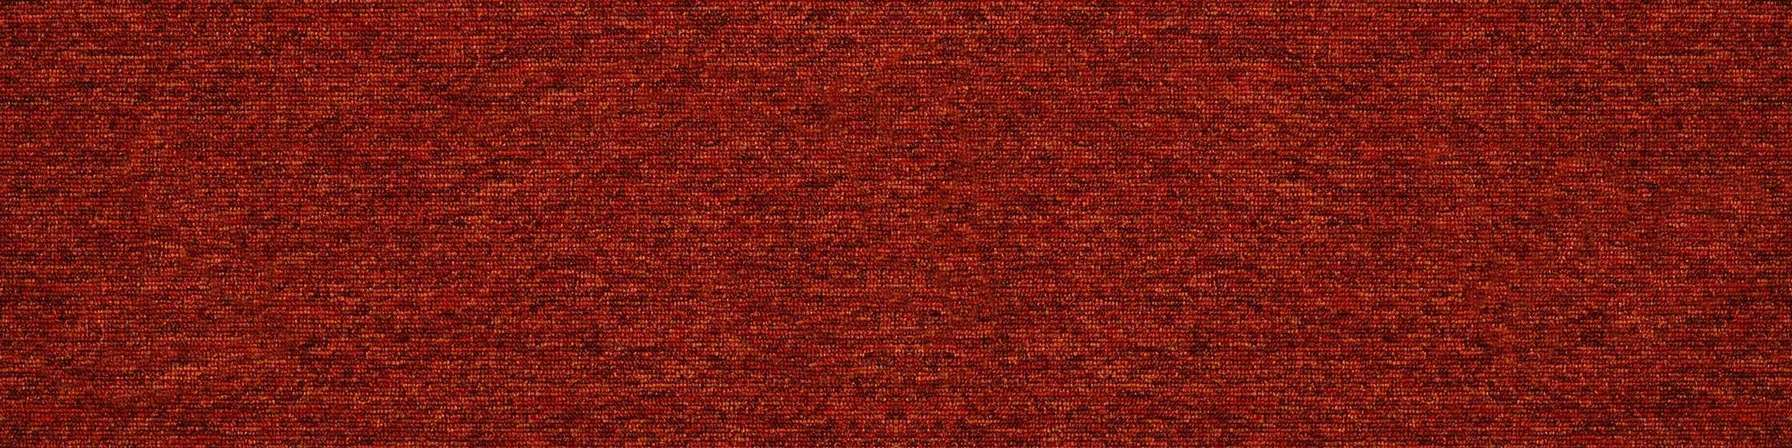 tivoli 21110 bellamy red carpet plank